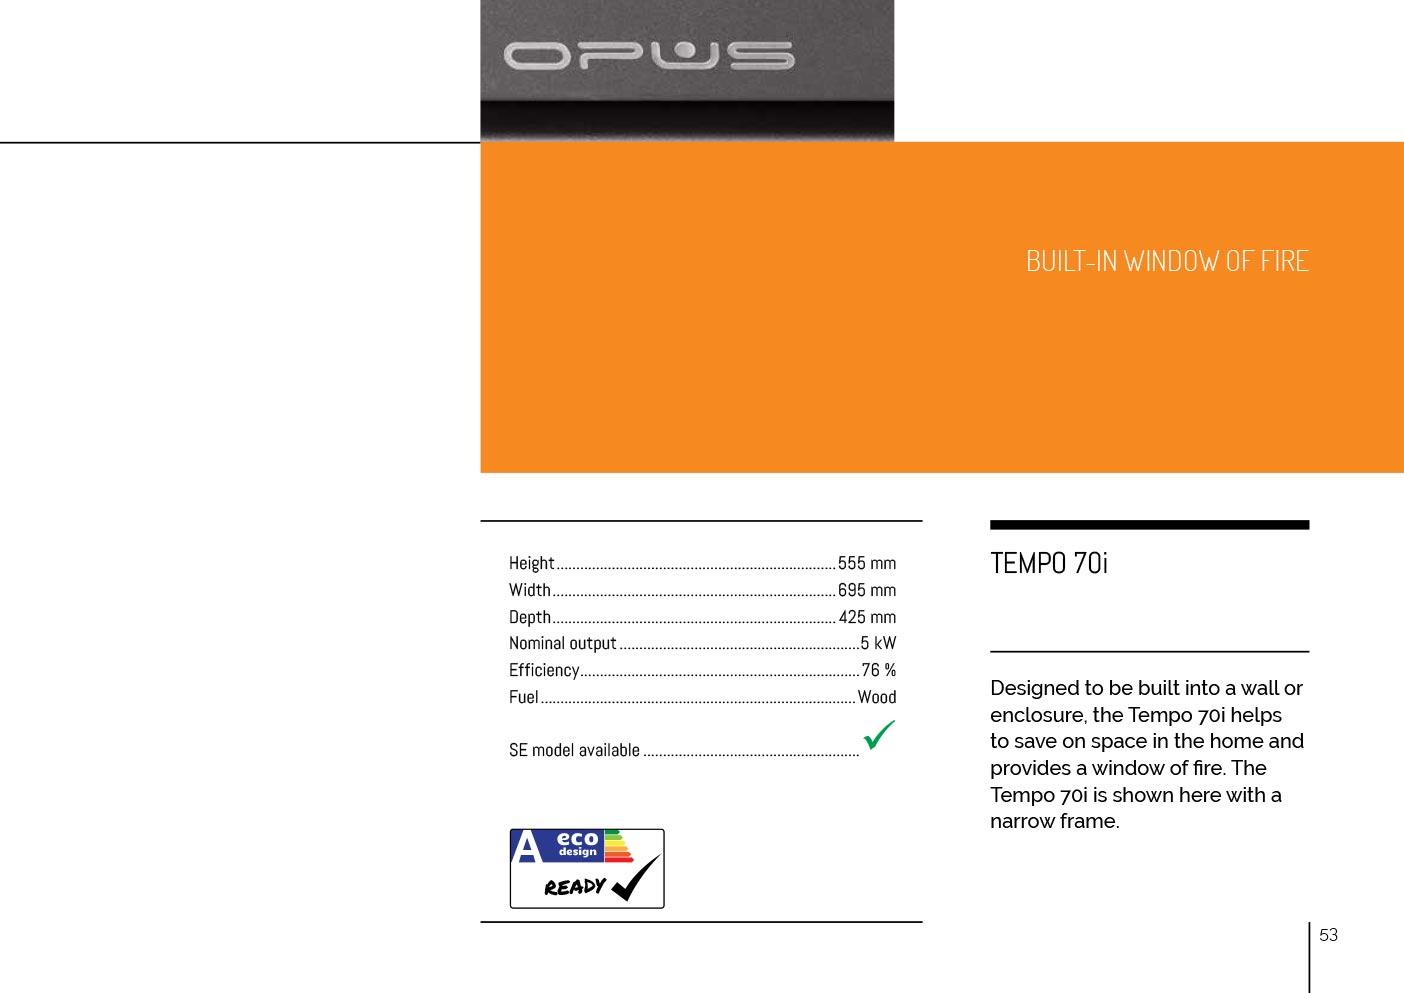 opus-stoves-brochure-(2)-53